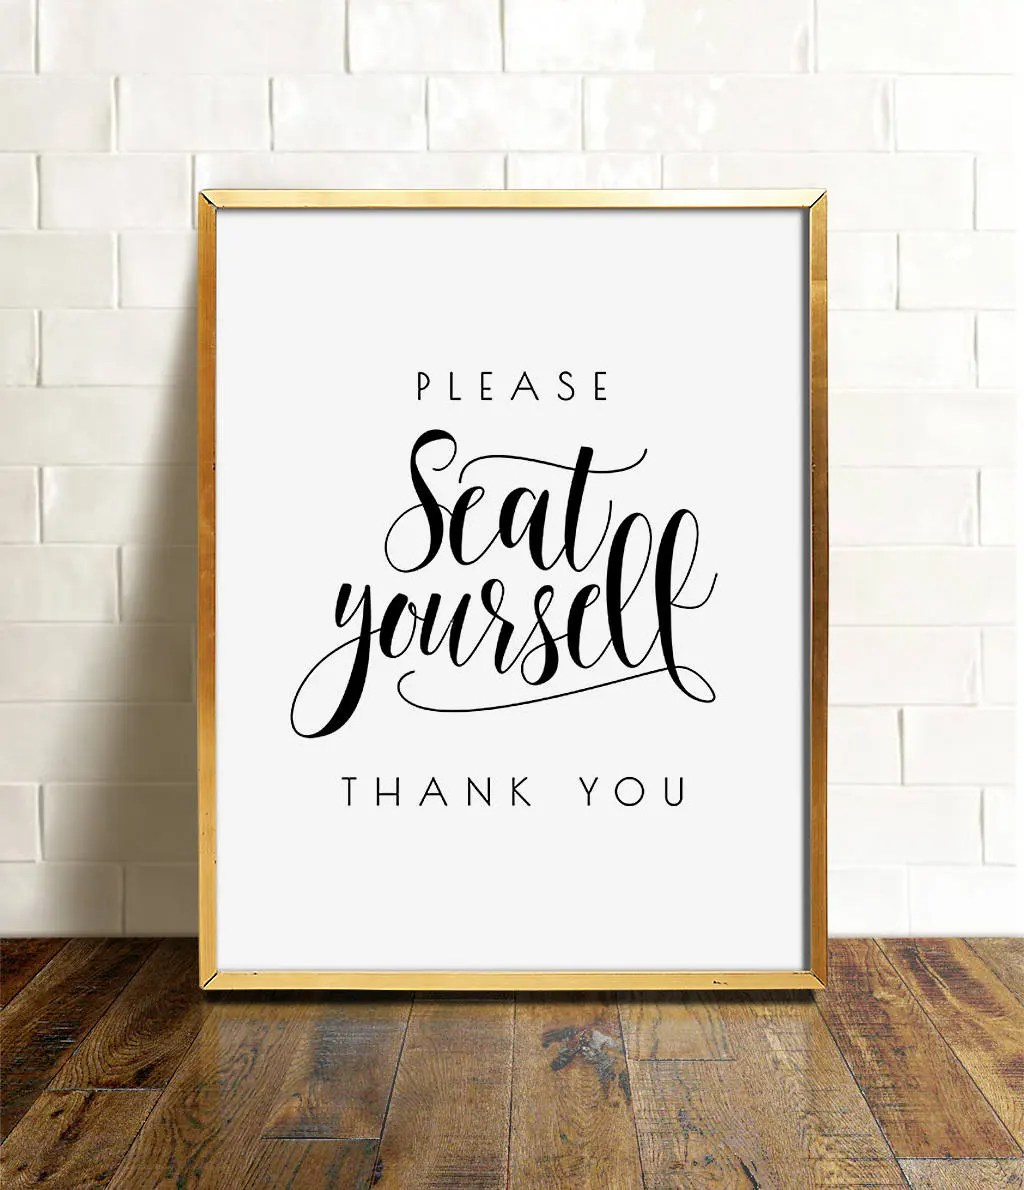 Please seat yourself Bathroom wall decor PRINTABLE art